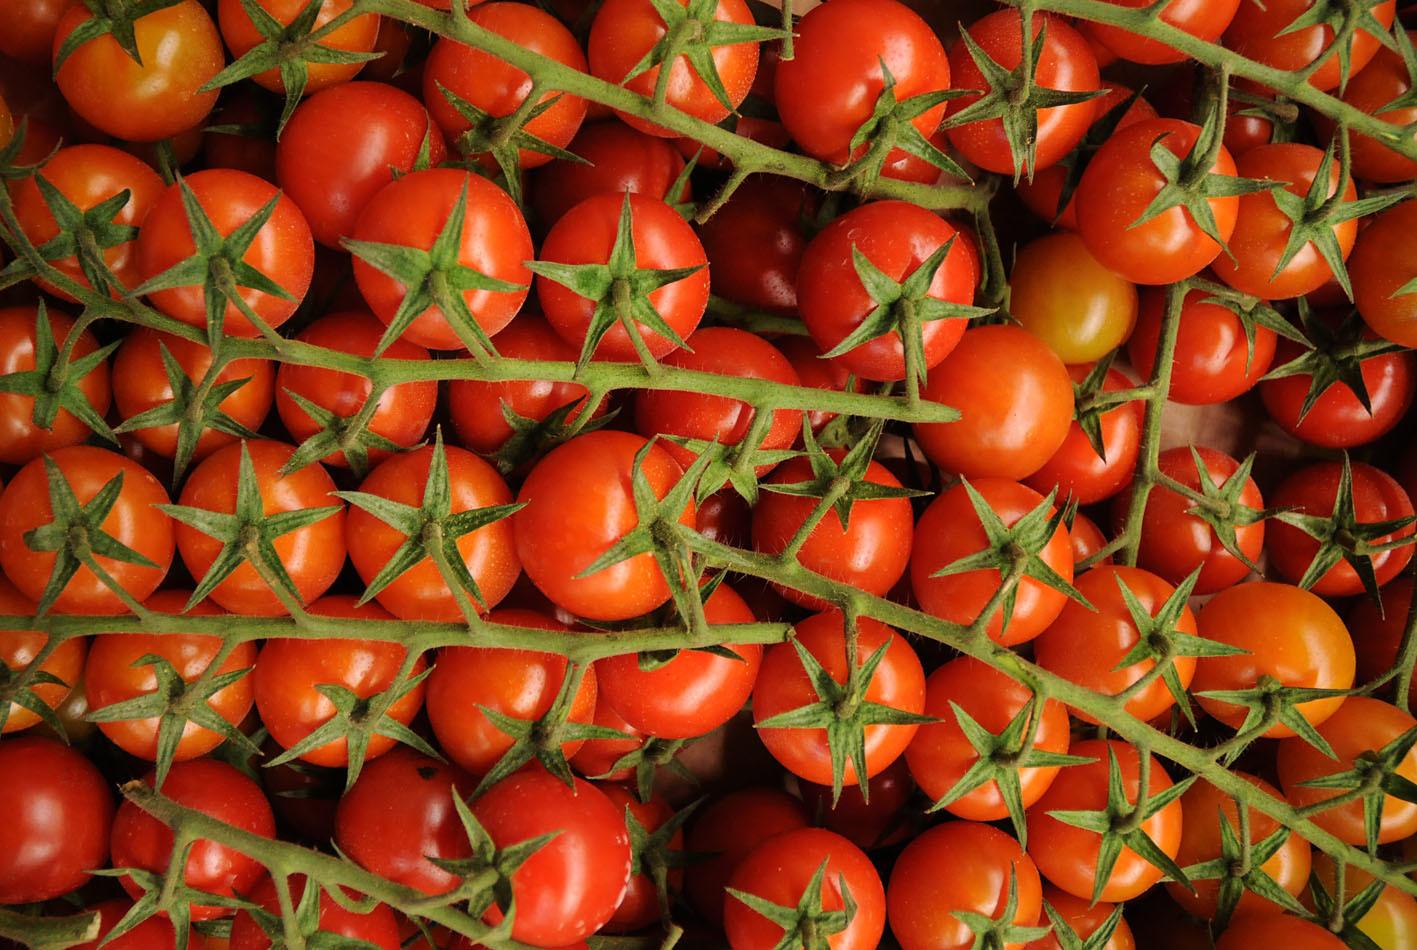 tomatoes_170922_144316.jpg?mtime=20170922144315#asset:11553